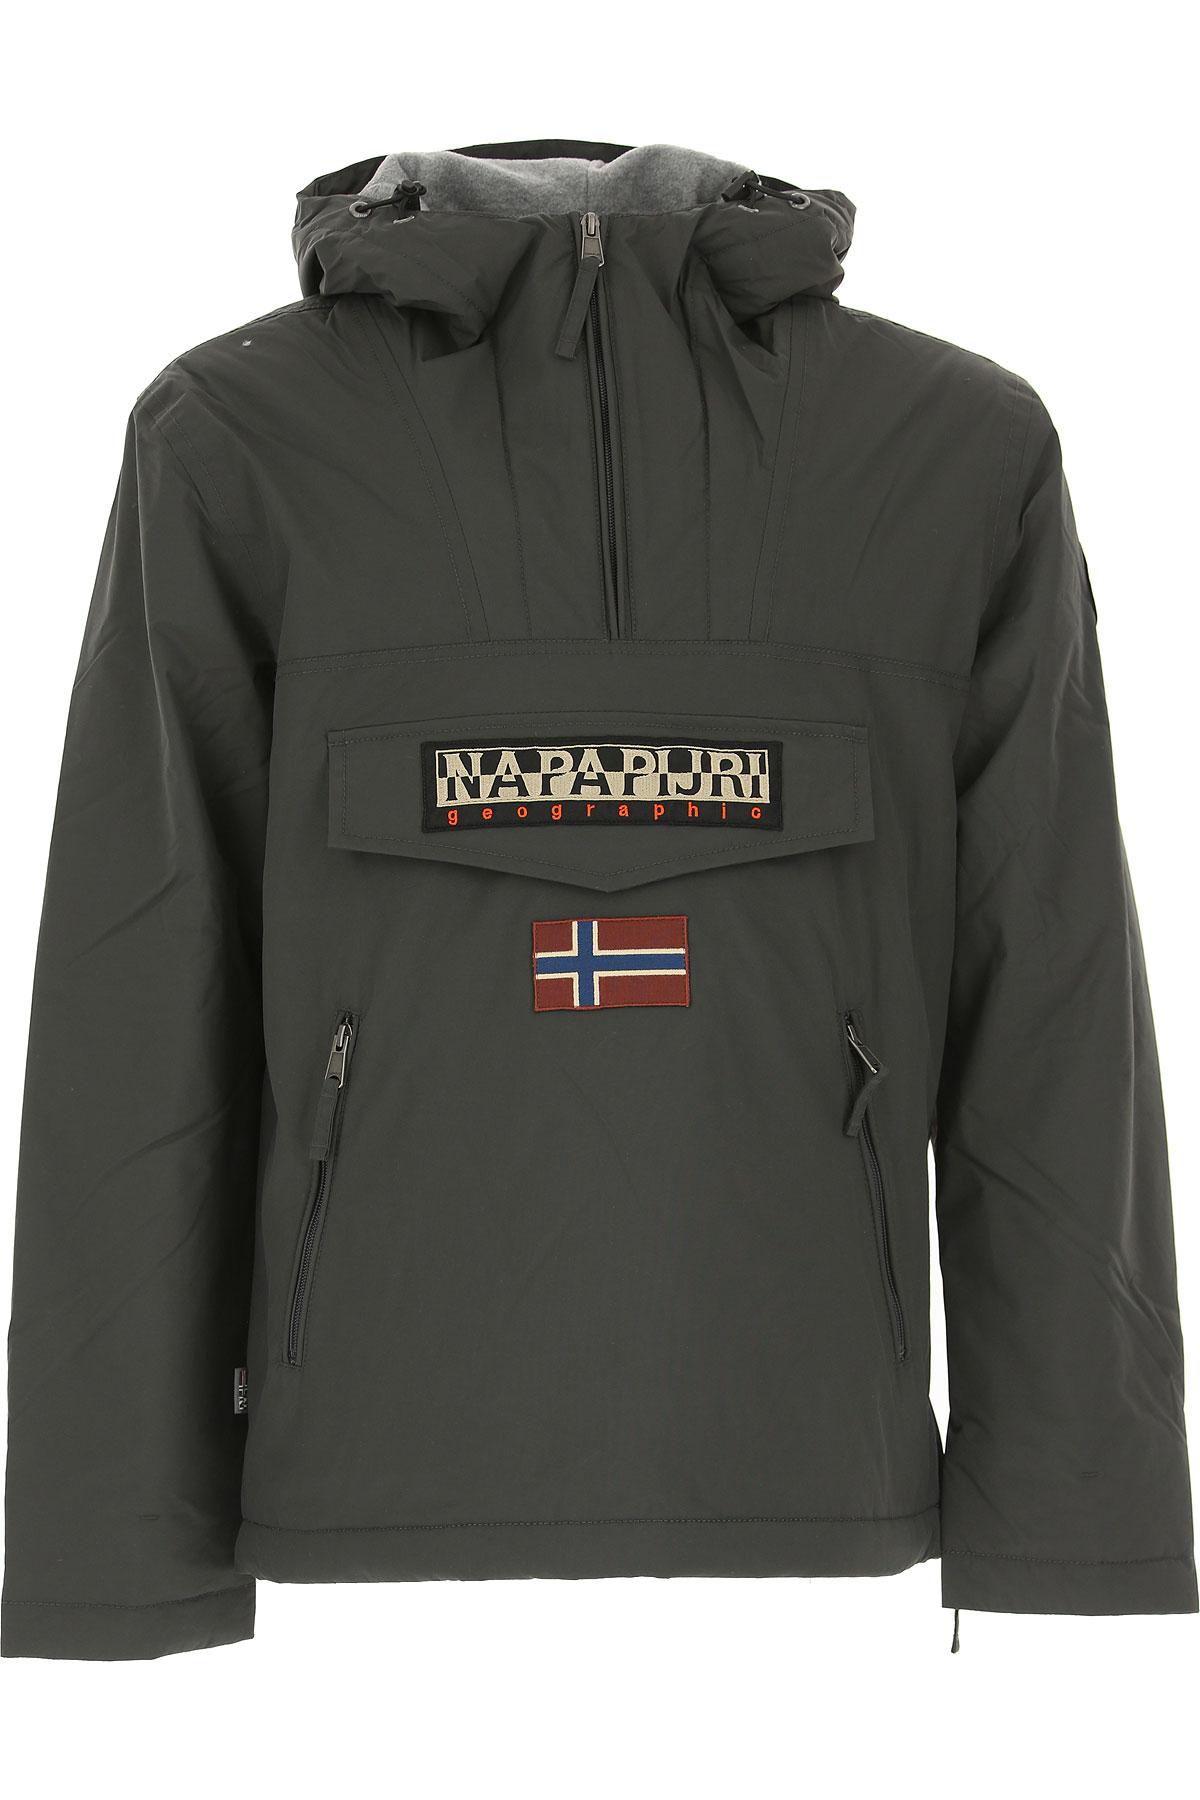 Image of Napapijri Down Jacket for Men, Puffer Ski Jacket, Dark Anthracite Grey, polyestere, 2017, M S XL XS